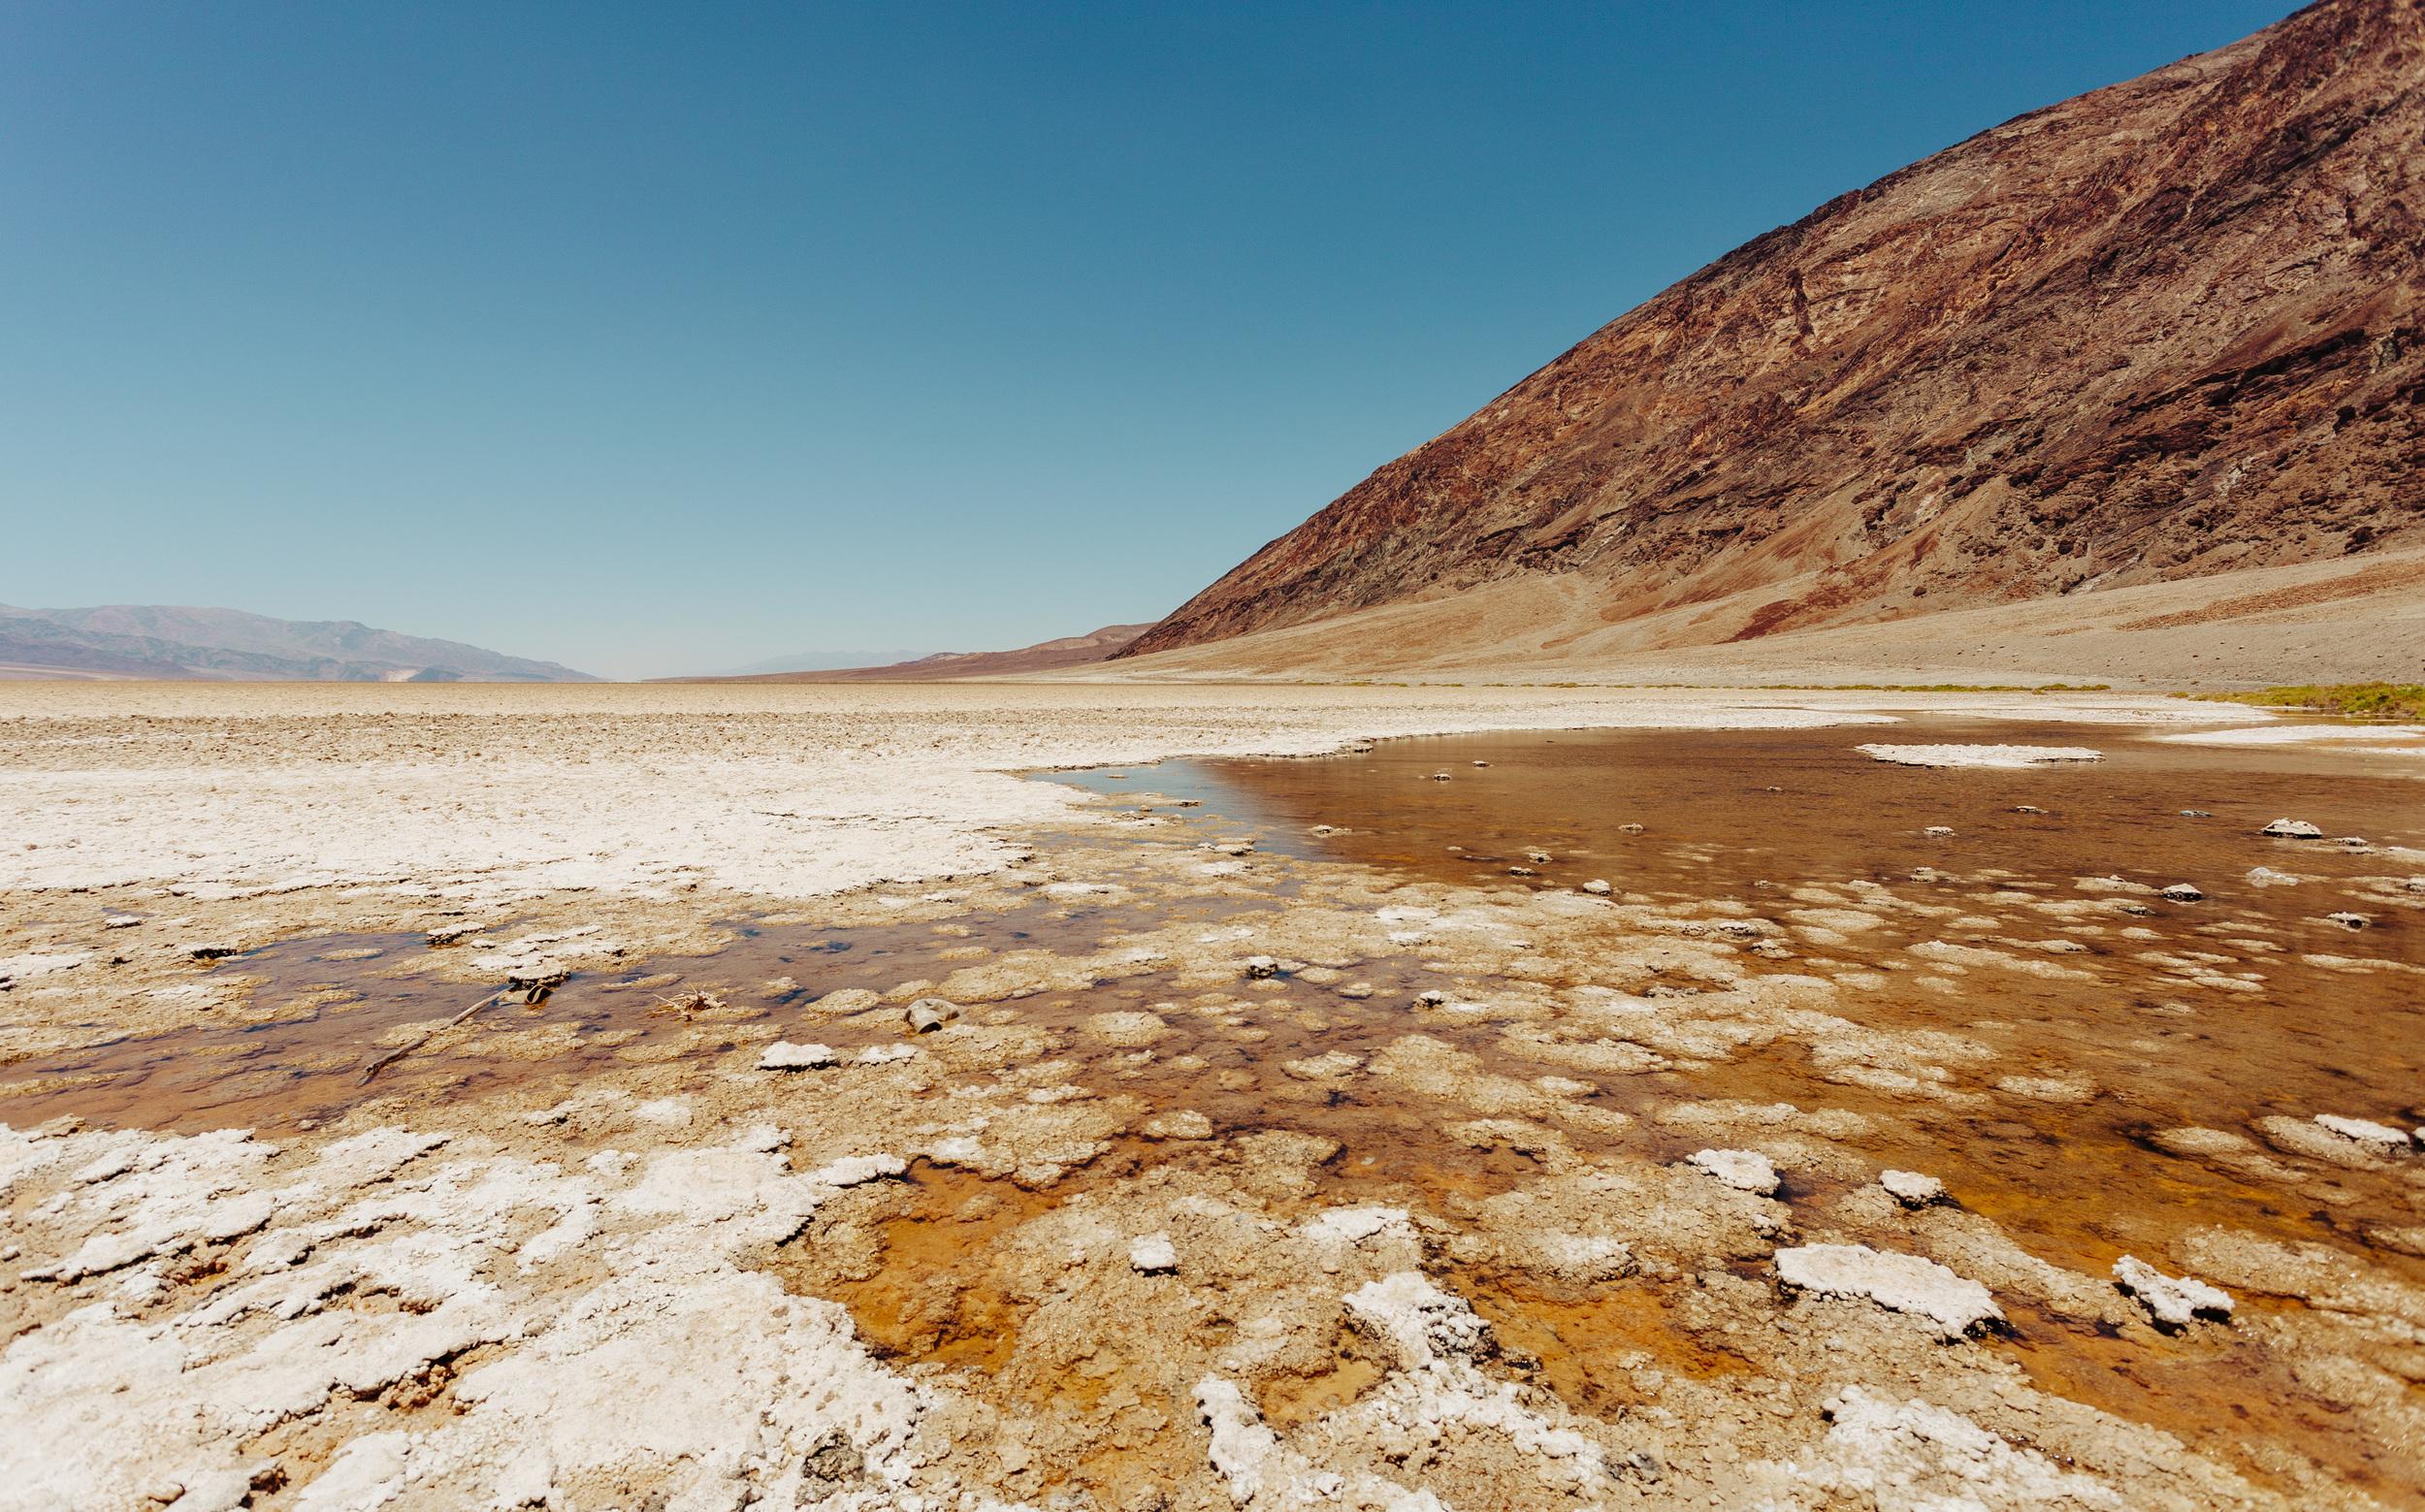 Death_Valley_mg_0193.jpg